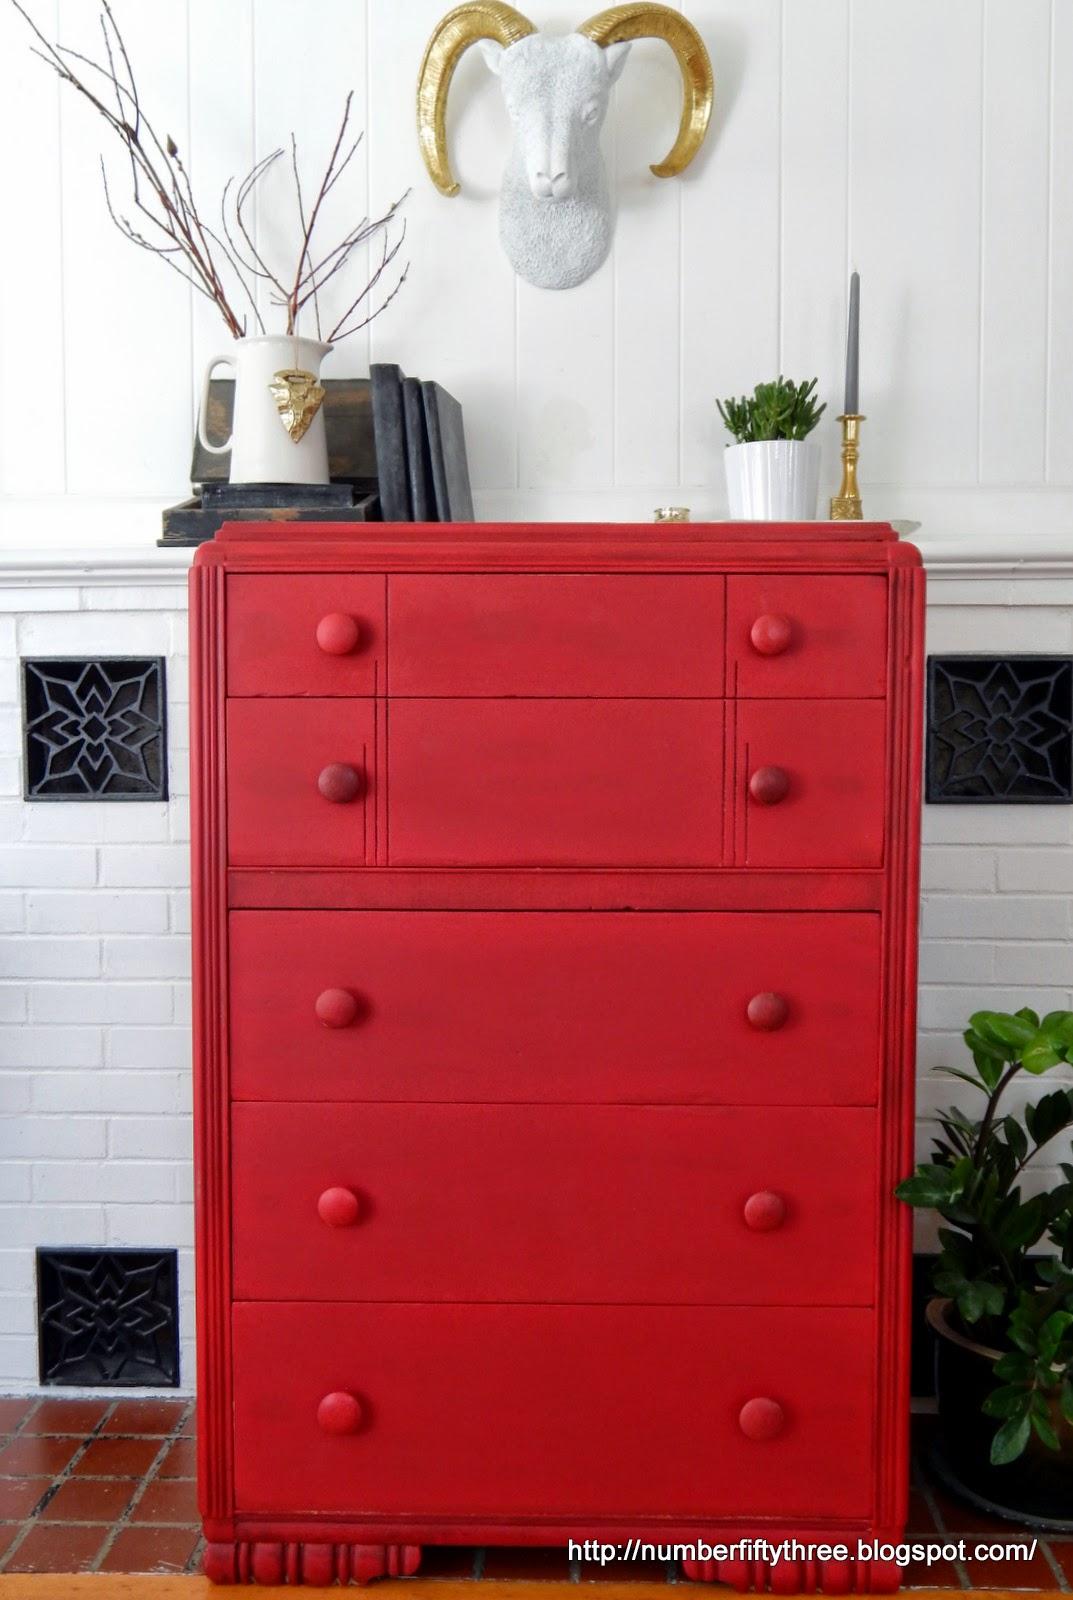 Number Fifty Three Vintage Red Dresser